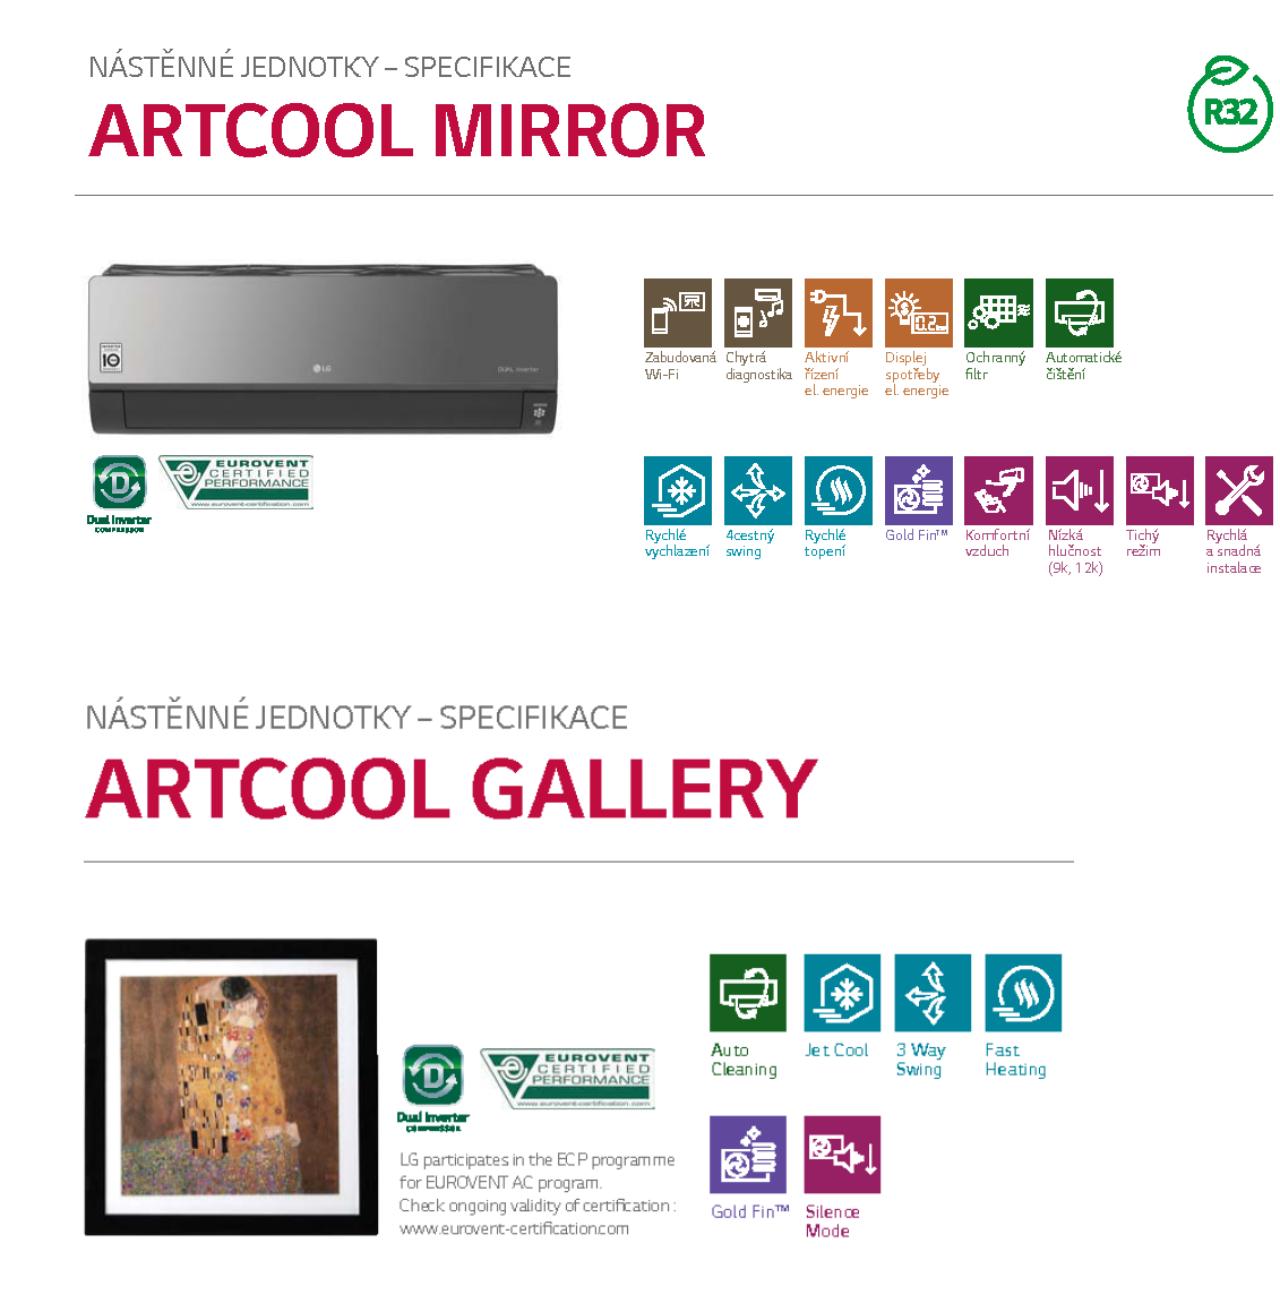 Obrázky artcool